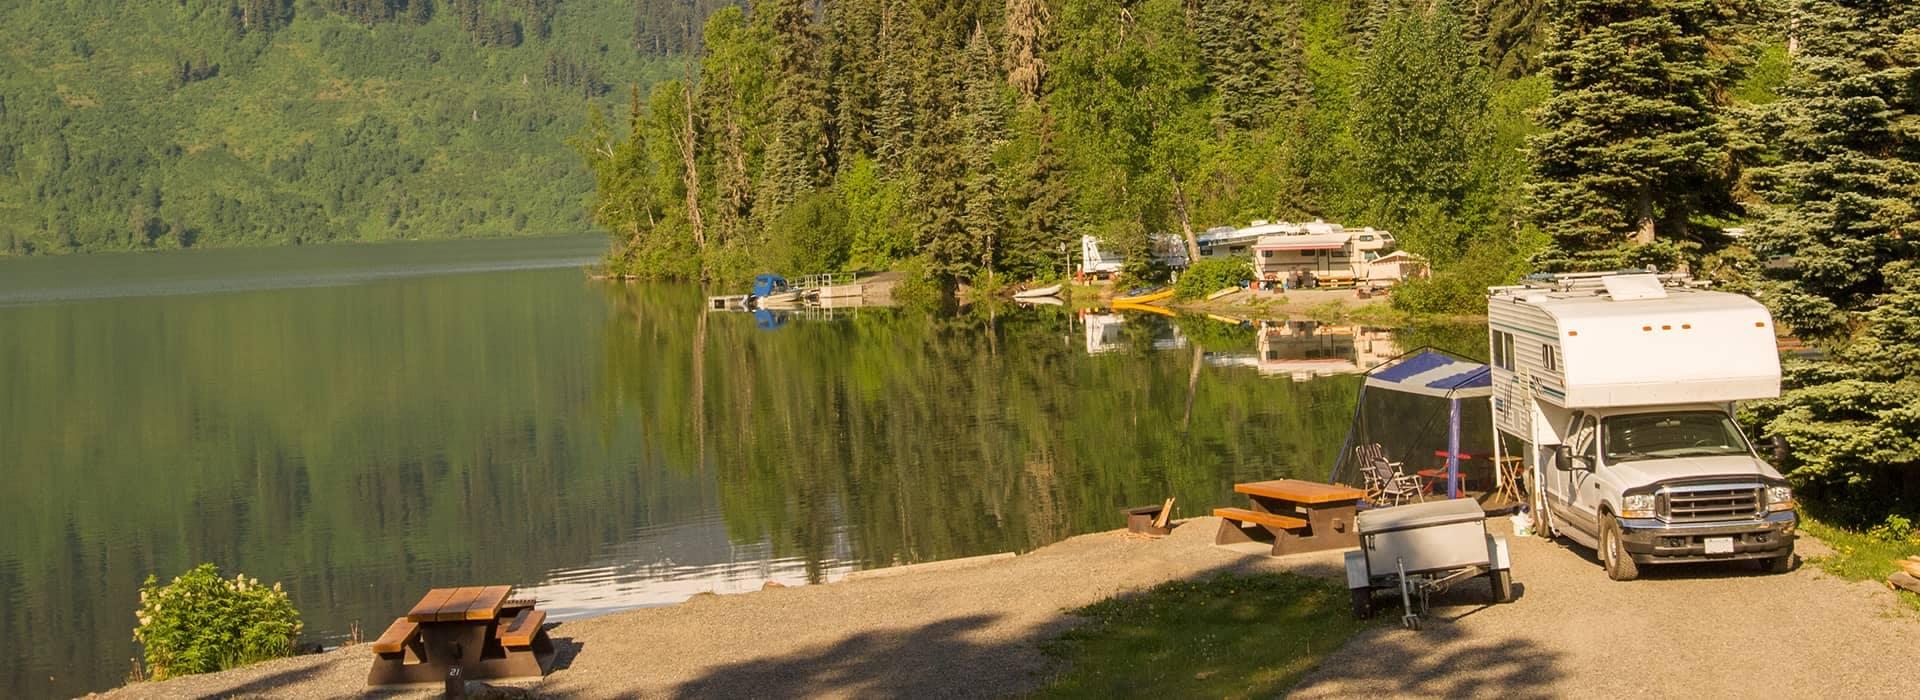 RV Campground on mountain lake